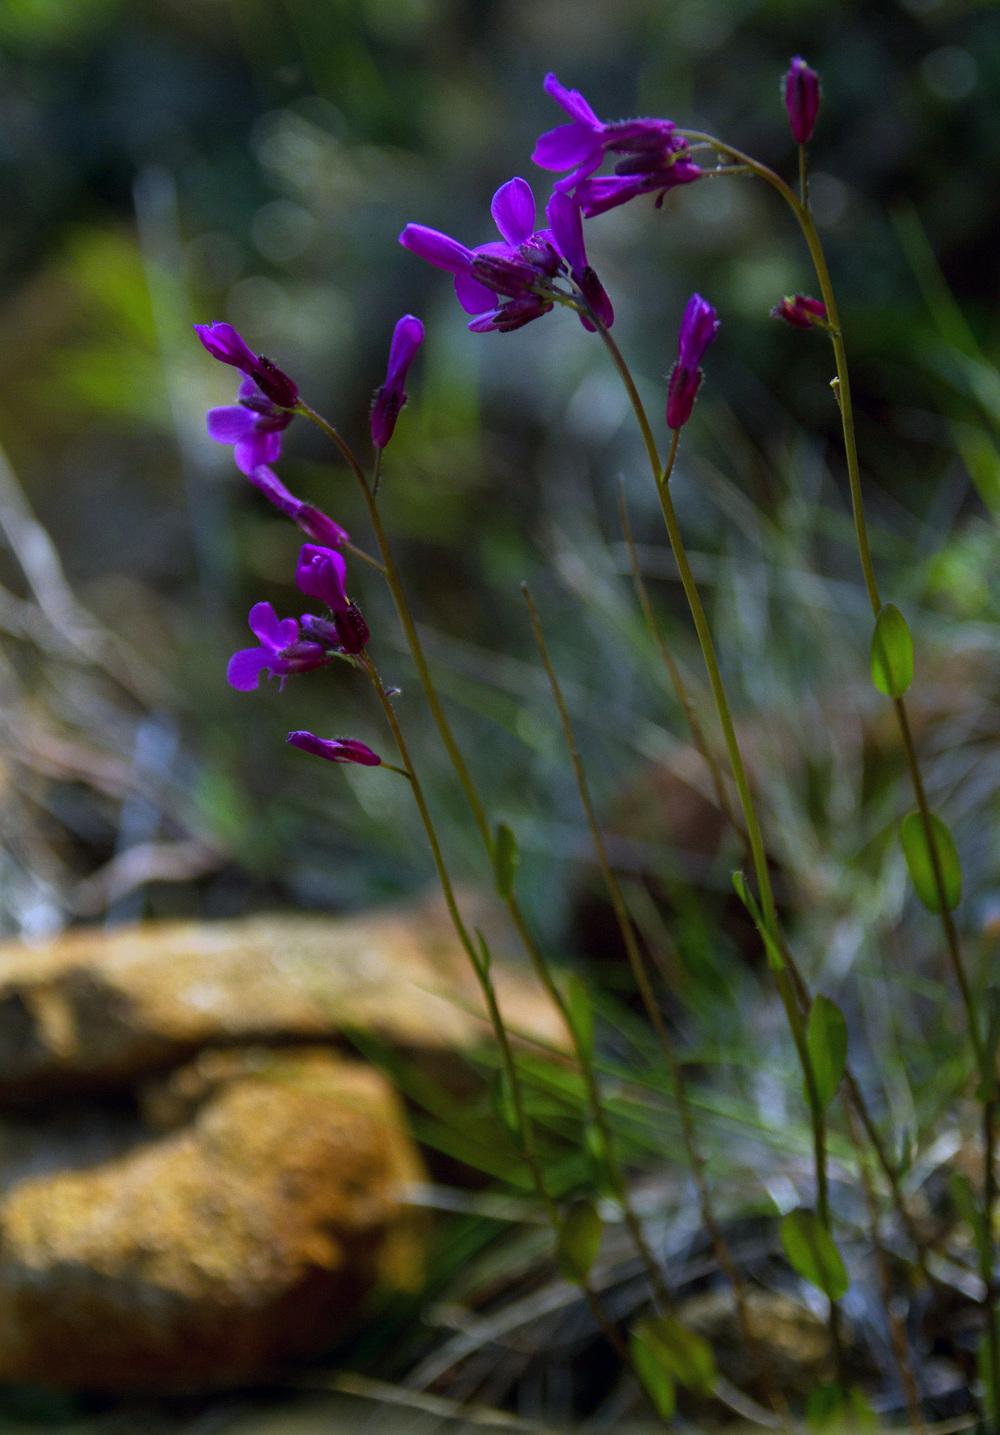 Rockcress, Arabis spp., photo (c) Darren Campbell 2015